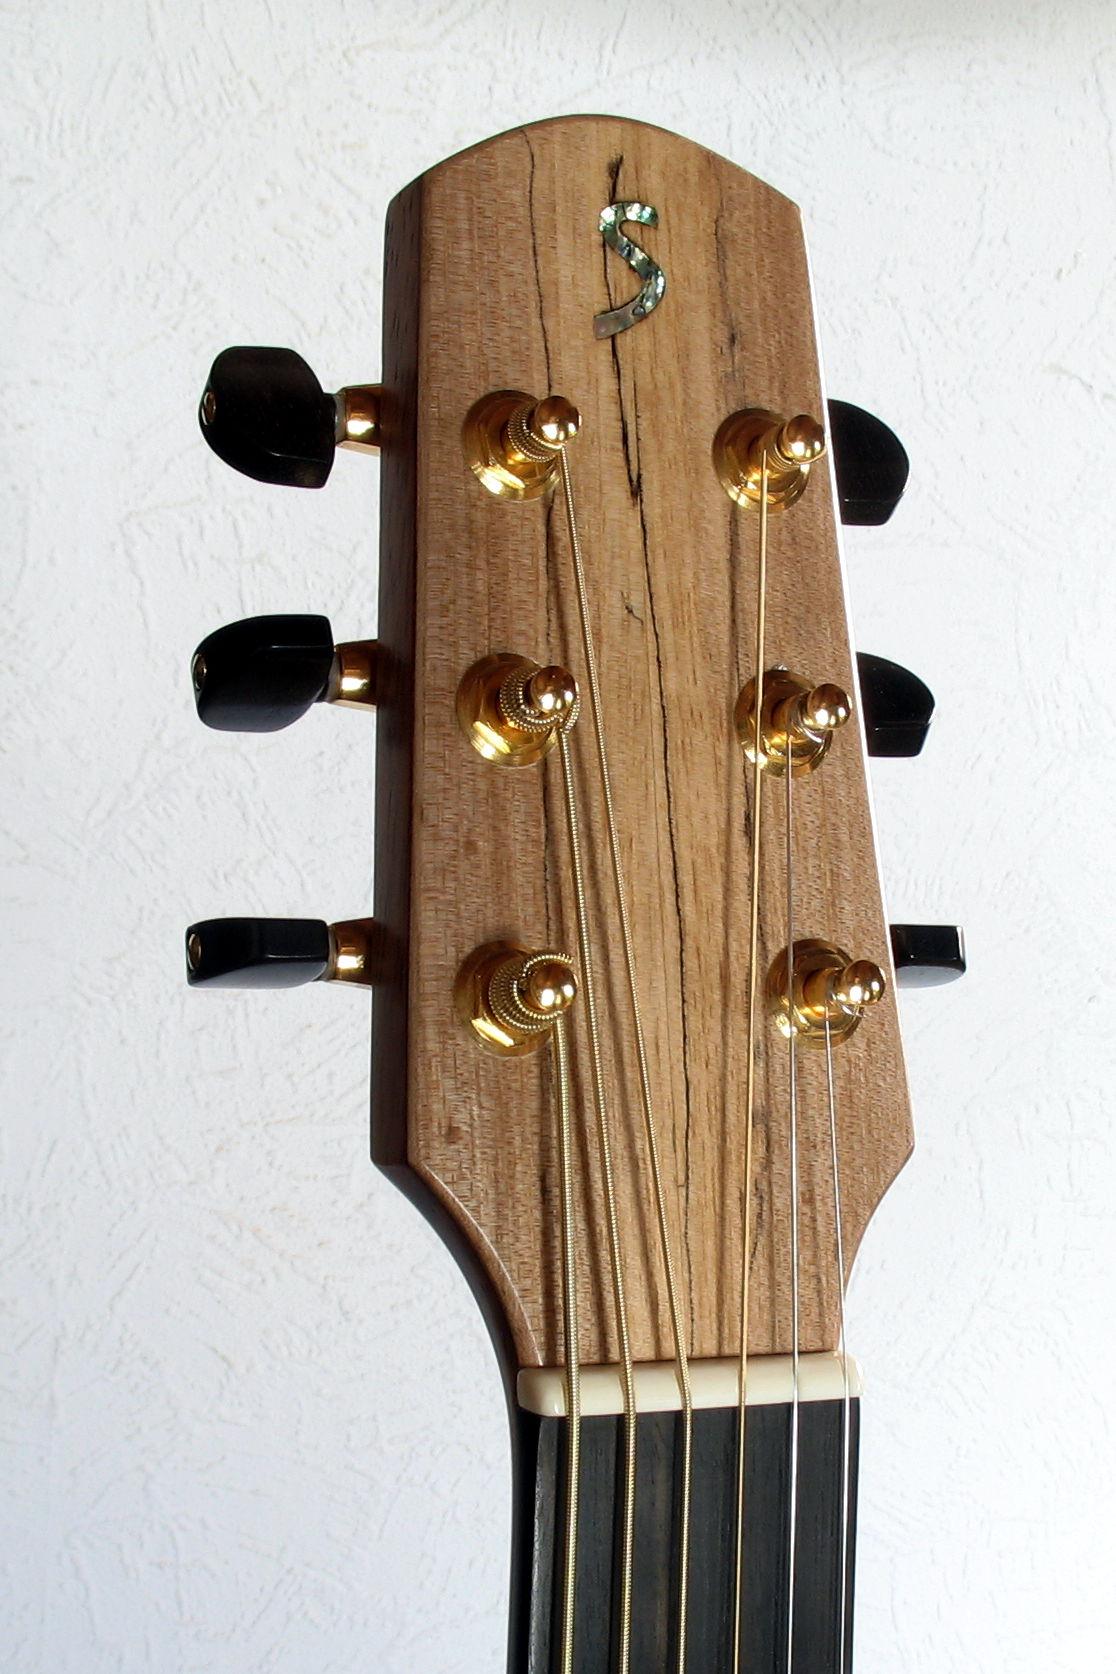 Steelstring Guitar Ambition Bariton - Walnut with side soundport - head